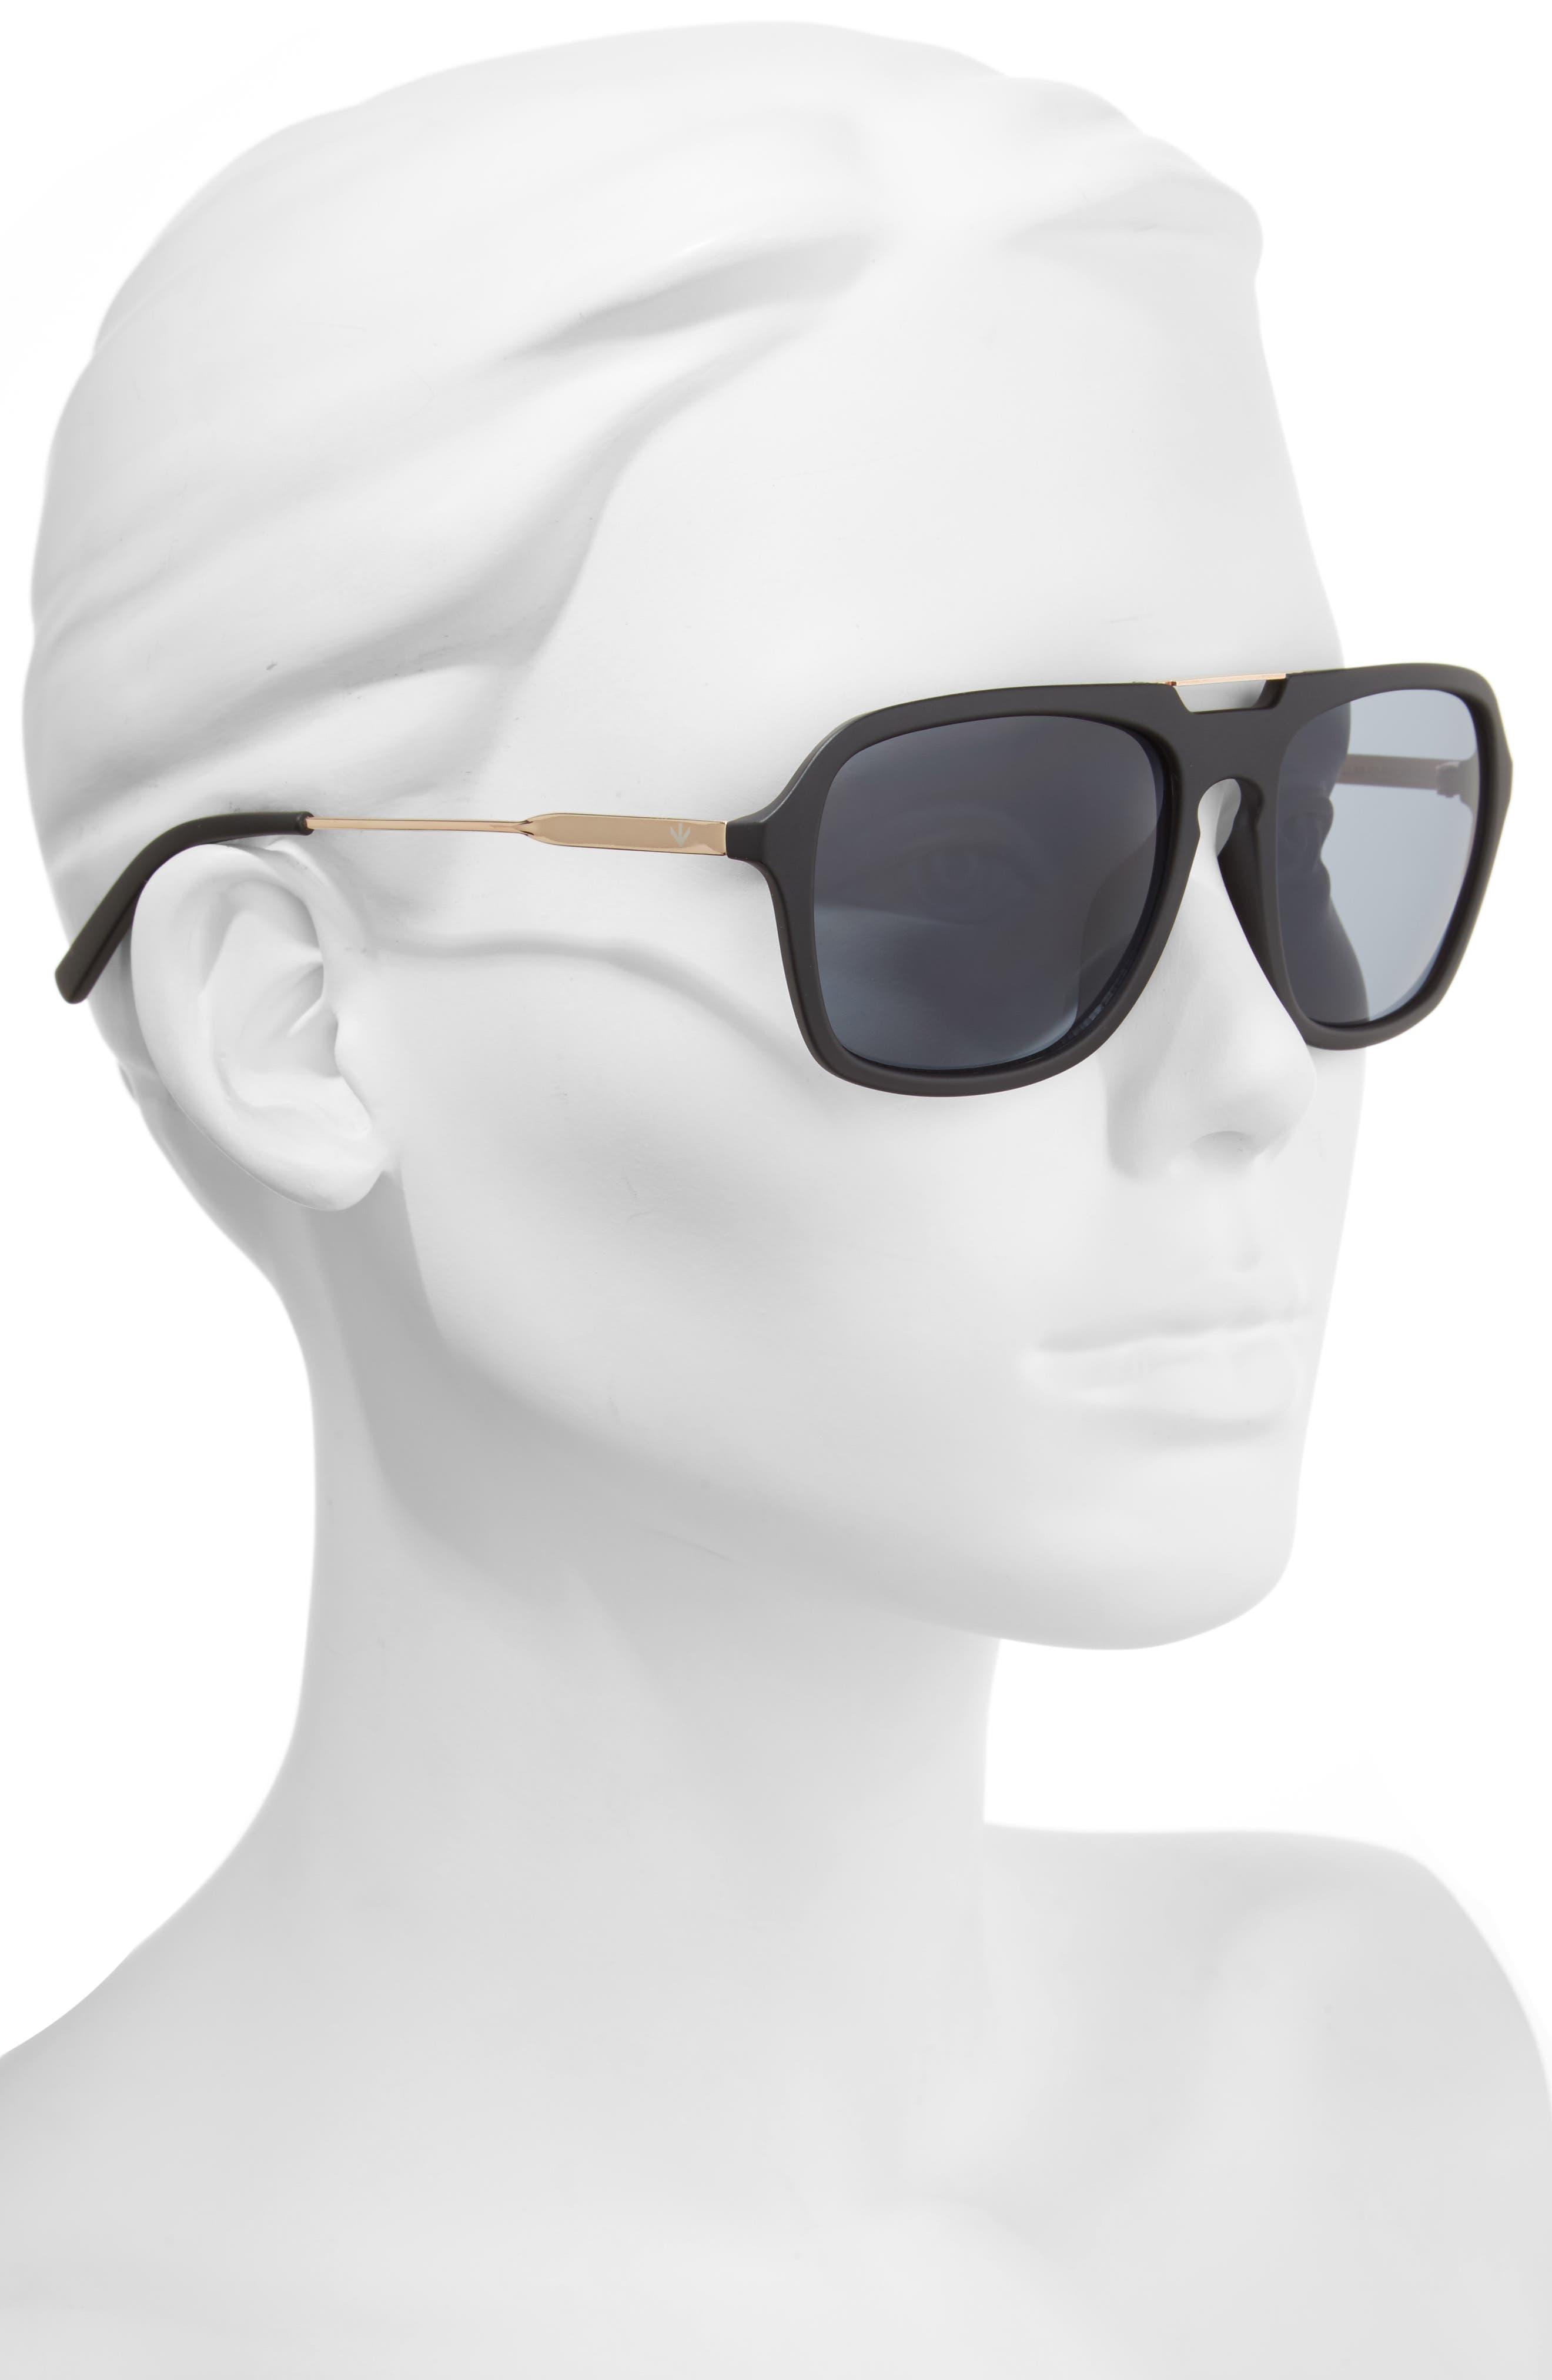 Chillax 55mm Polarized Aviator Sunglasses,                             Alternate thumbnail 2, color,                             001